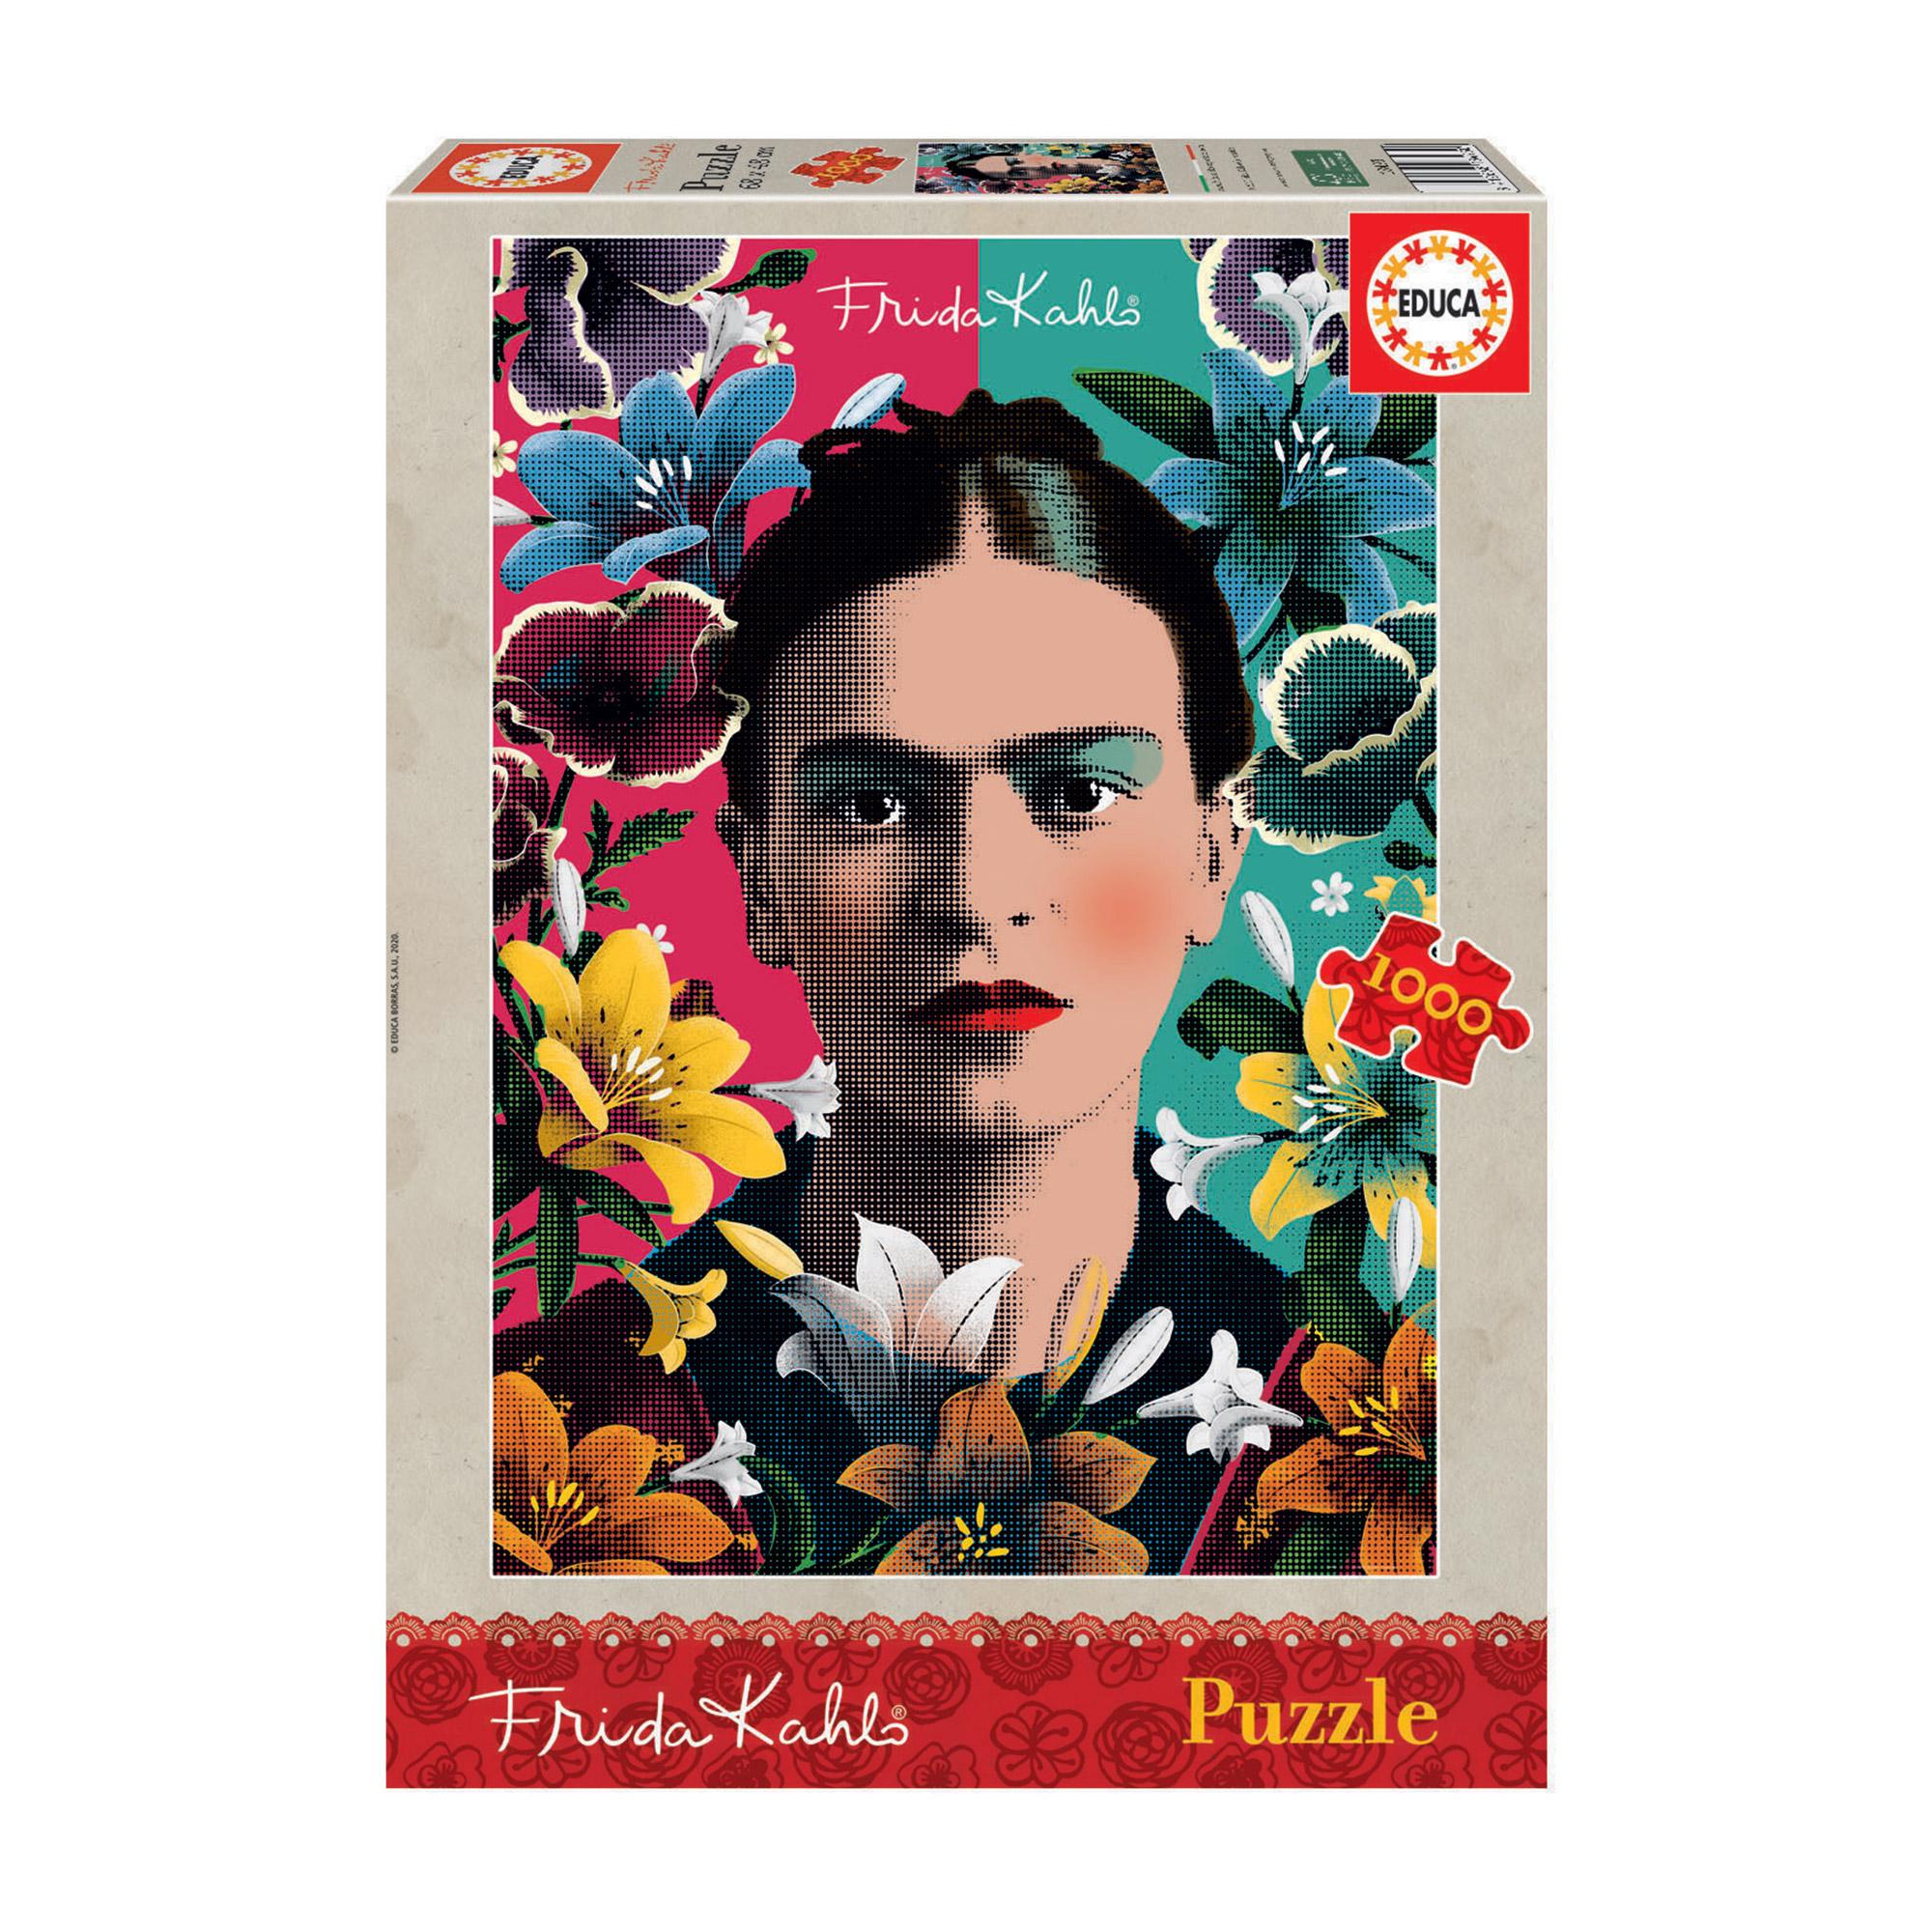 Фото - Пазл Educa Фрида Кало 1000 деталей пазл educa мир банкнот 1000 деталей